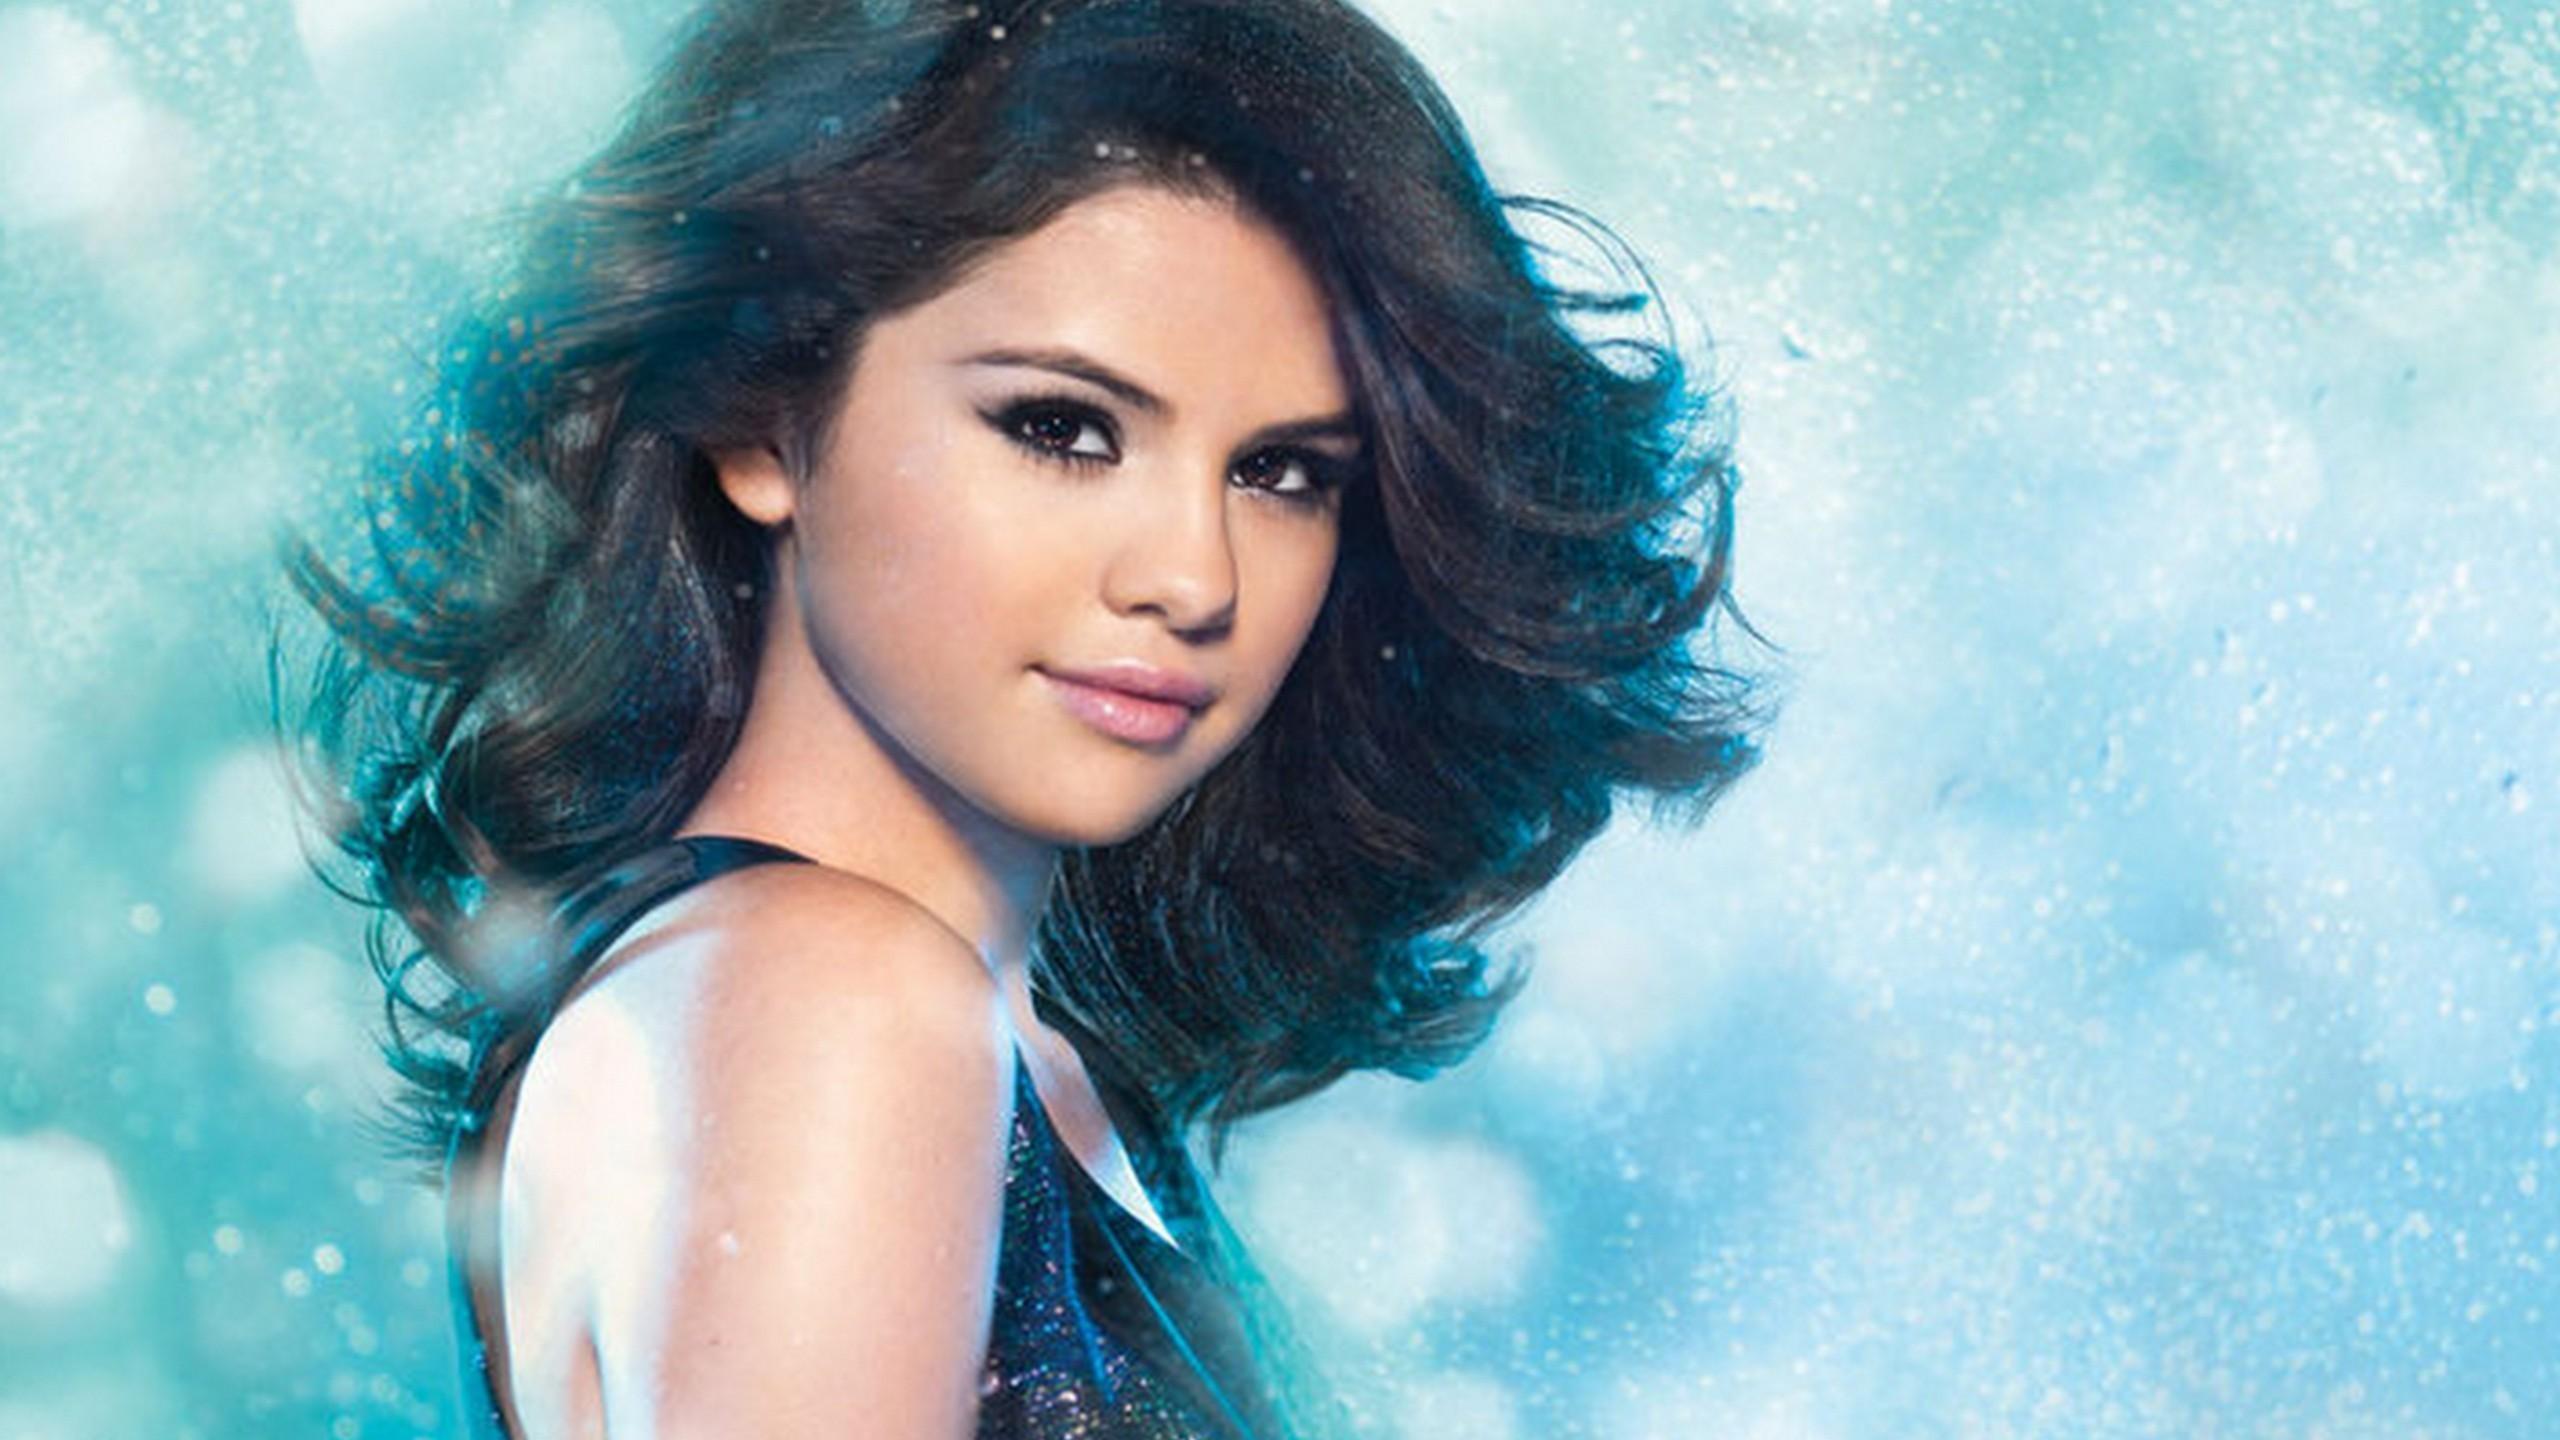 Selena Gomez Wallpapers   Selena Gomez Wallpaper 16407017 2560x1440